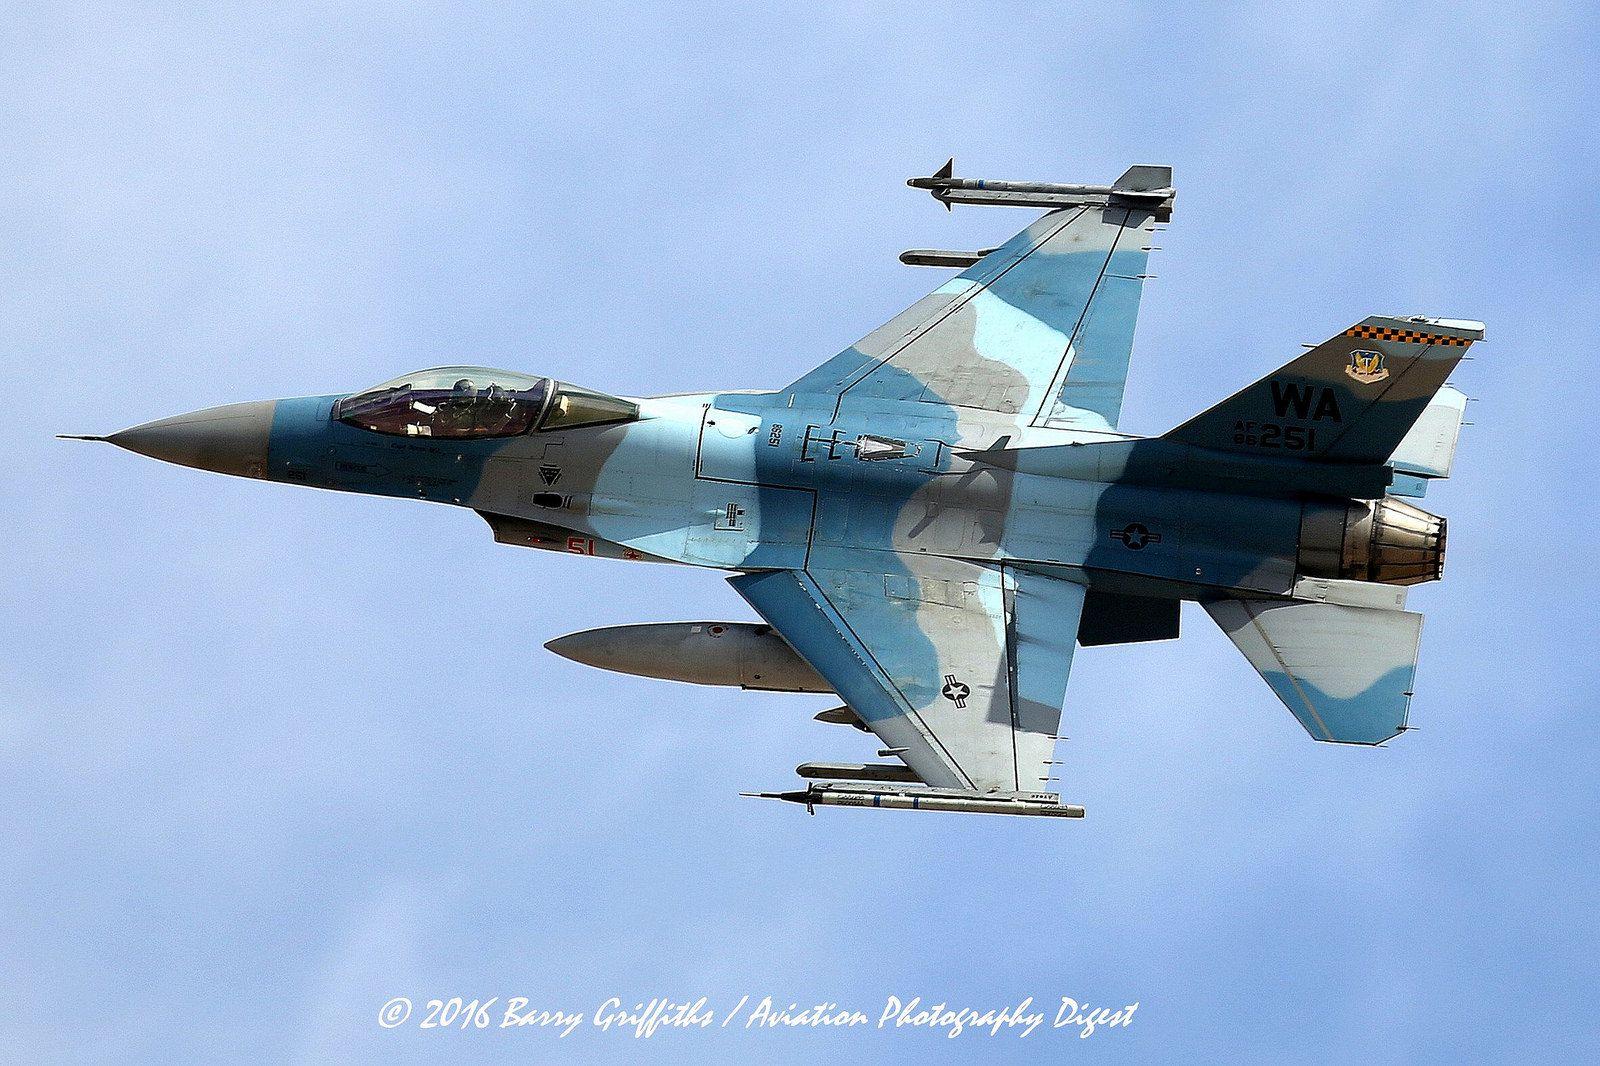 FLEX OPTION LAUNCH: RED FLAG 16-2 General Dynamics F-16C Viper USAF 86-0251 64th Aggressor Squadron (AGRS) 57th Adversary Tactics Group (ATG)